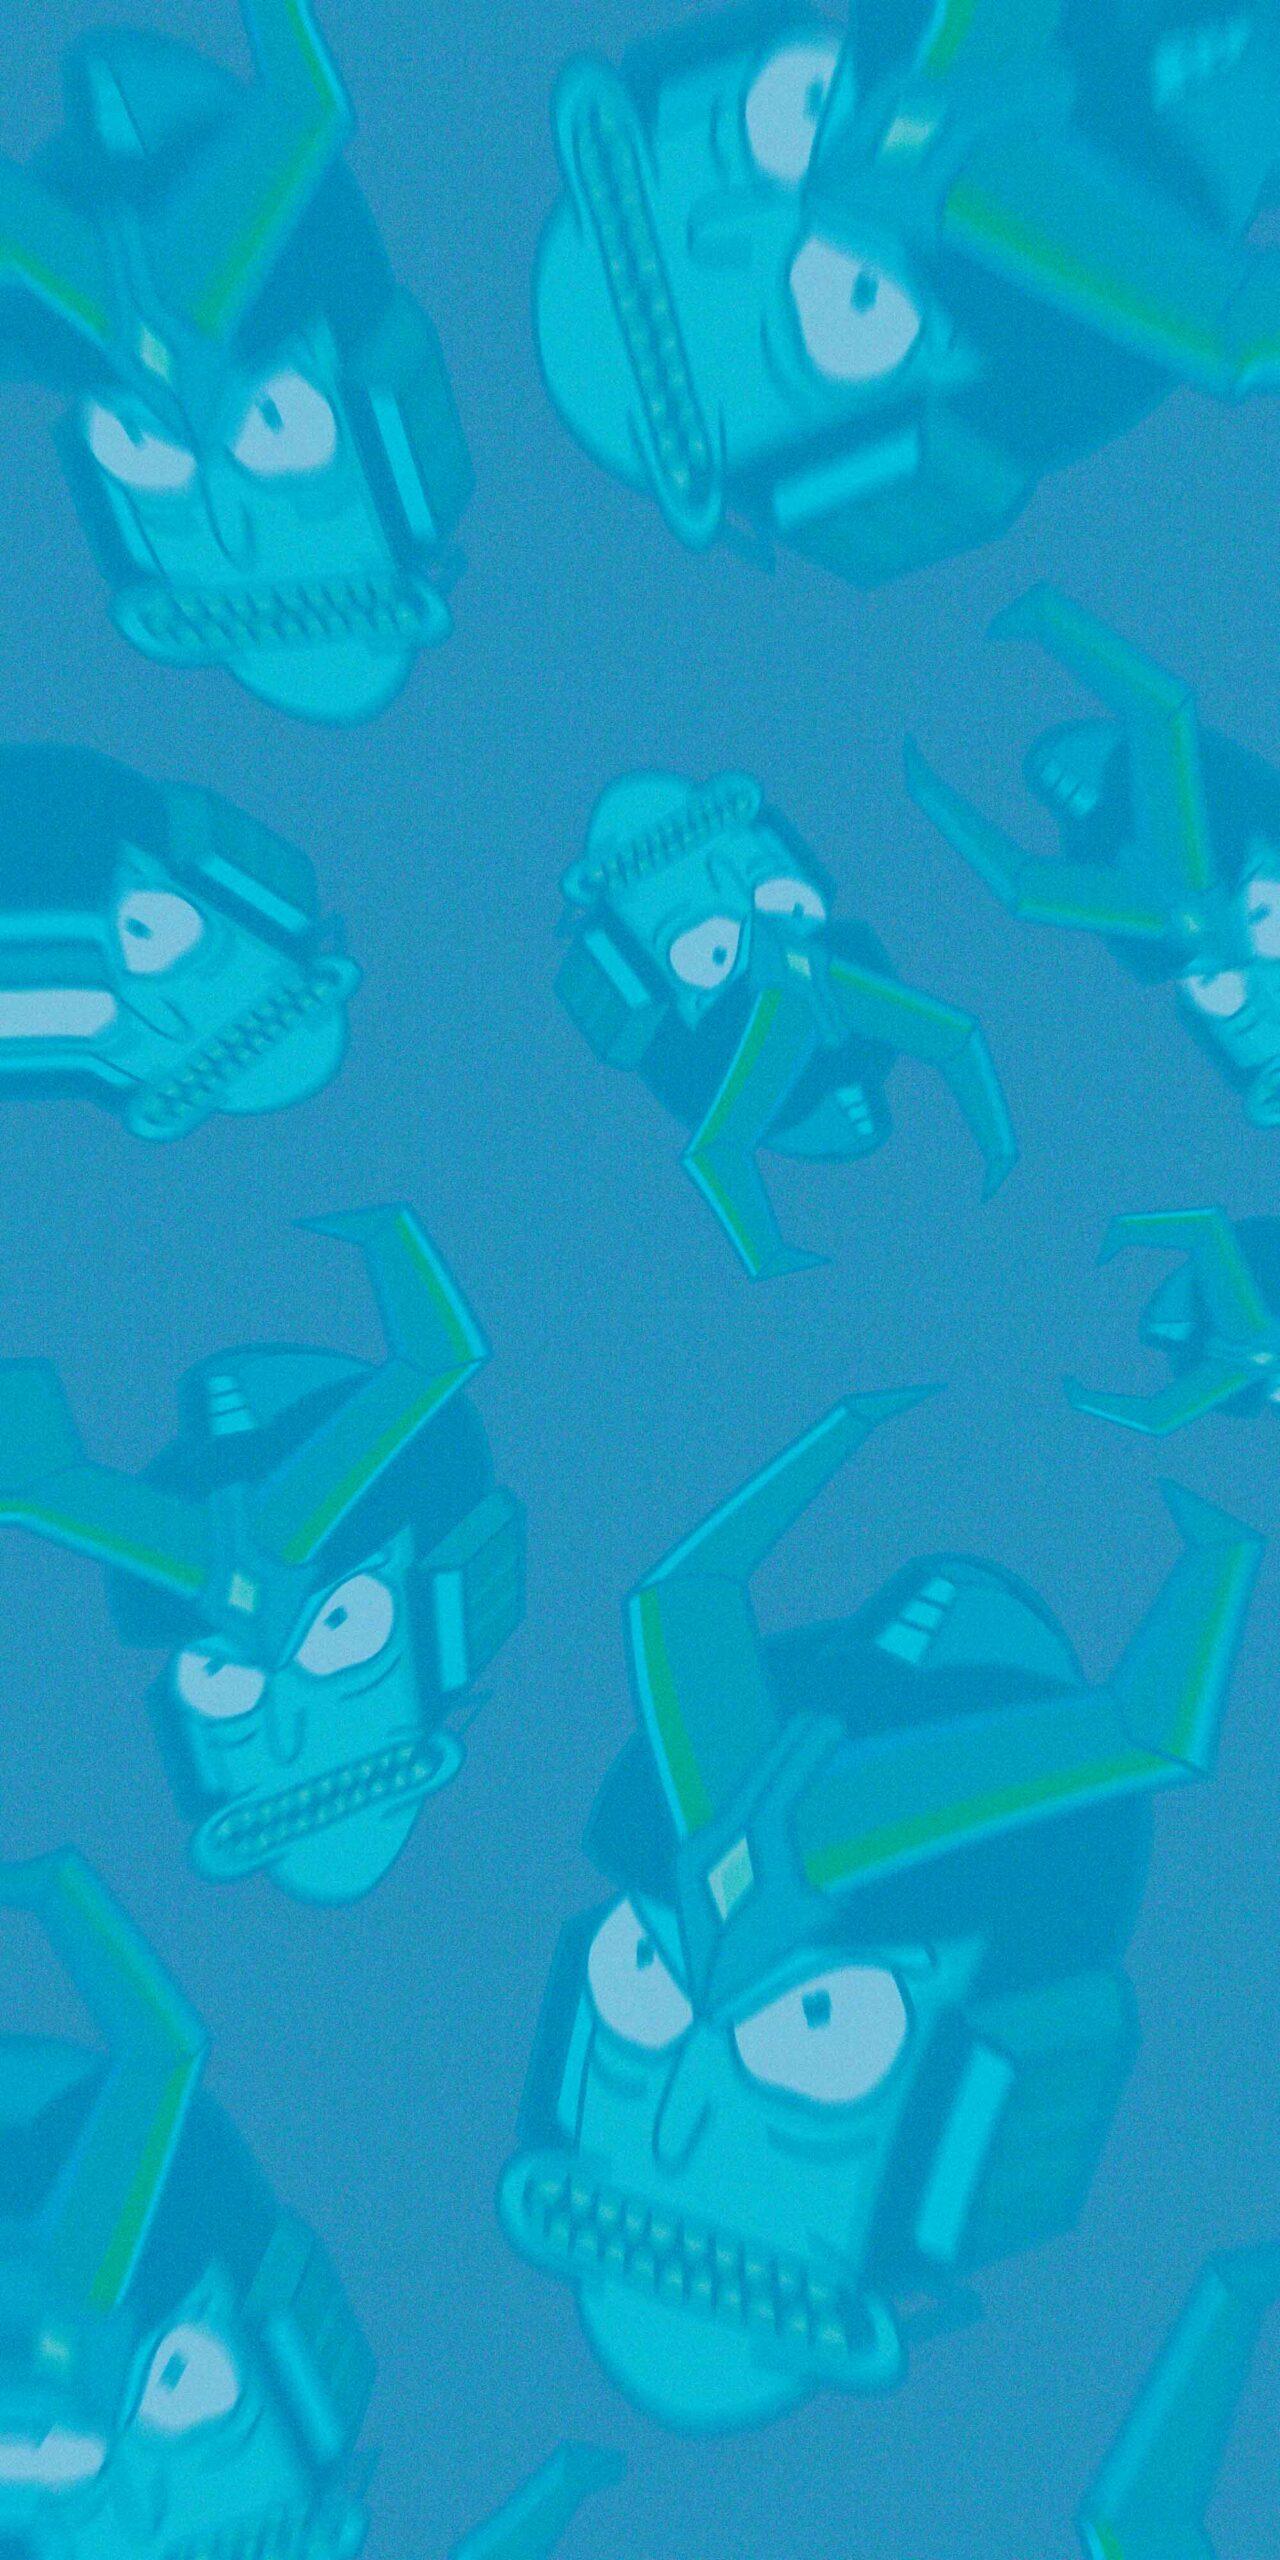 Rick Sanchez Gundam Blue Wallpapers - Rick and Morty ...